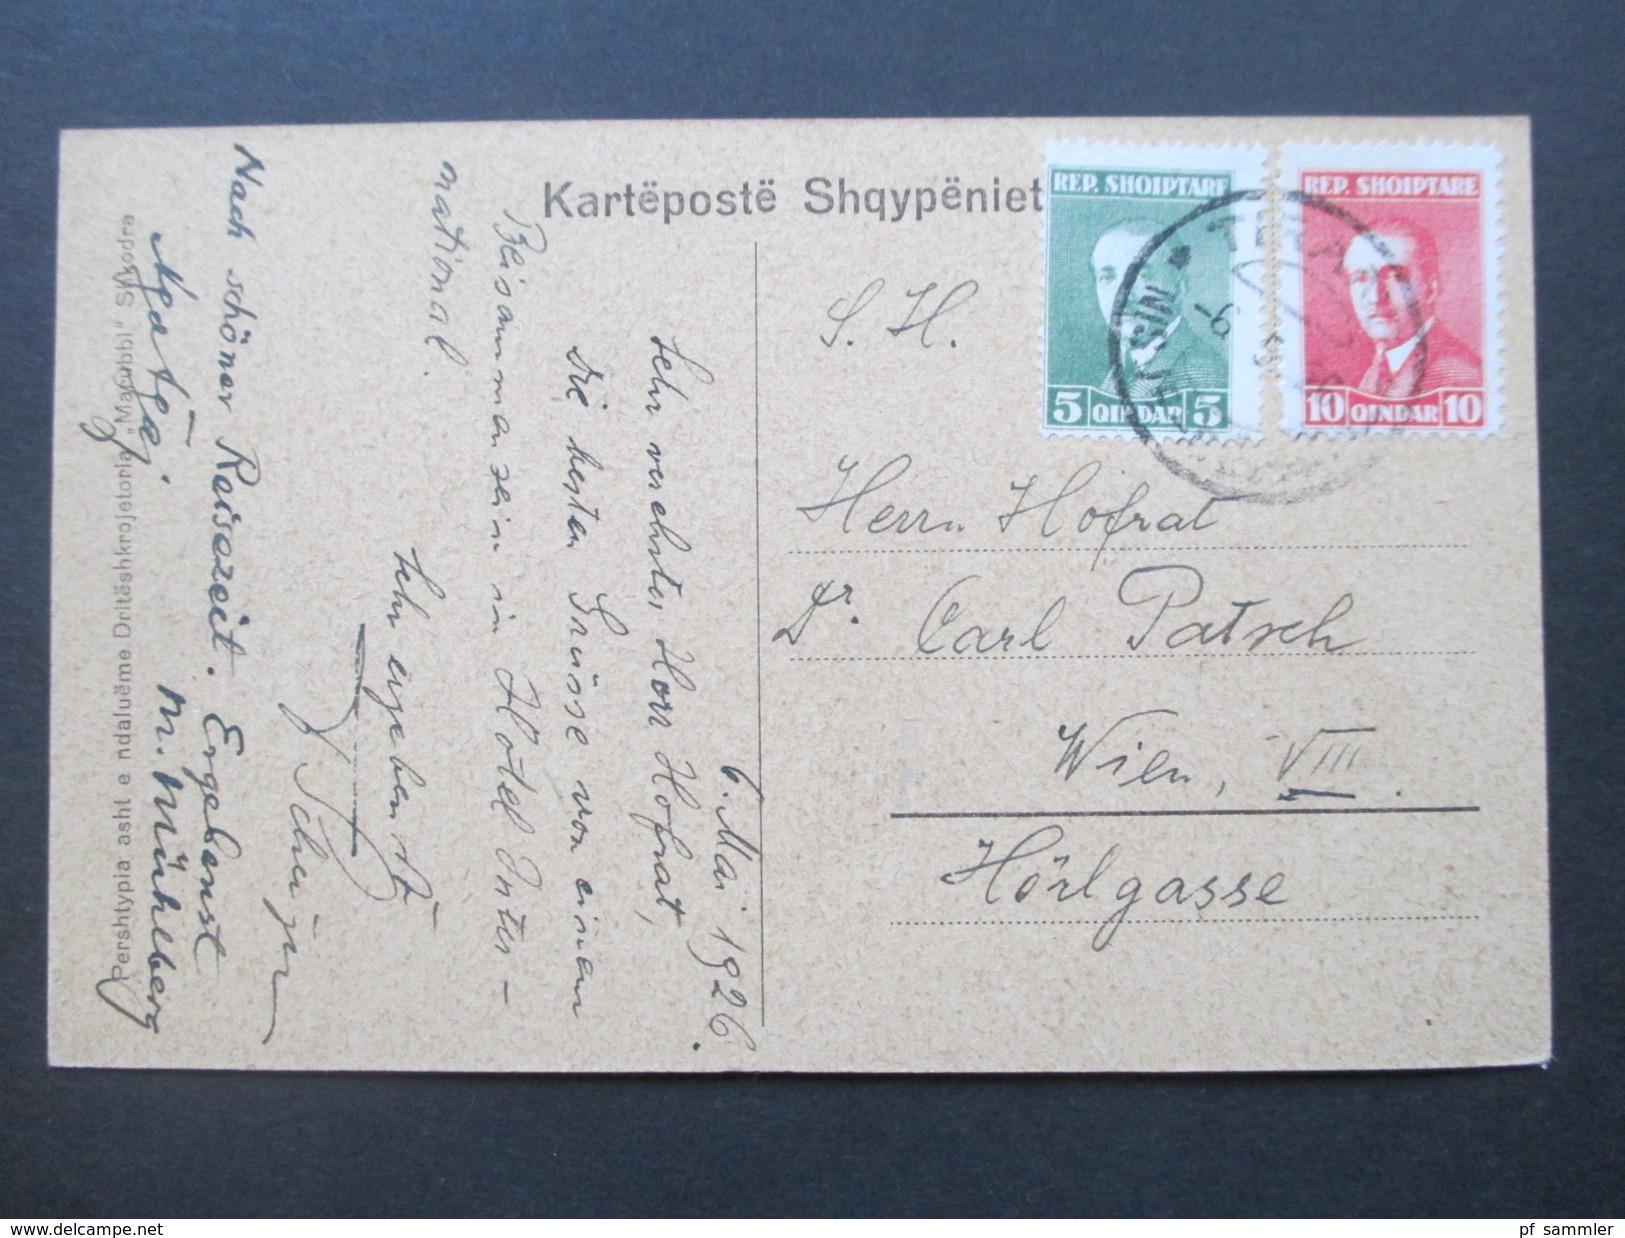 AK 1926 Albanien Durres. Fusha E Kasapvet. Seltene Karte! Social Philately Carl Patsch Archaeologe Und Historiker!! - Albanien